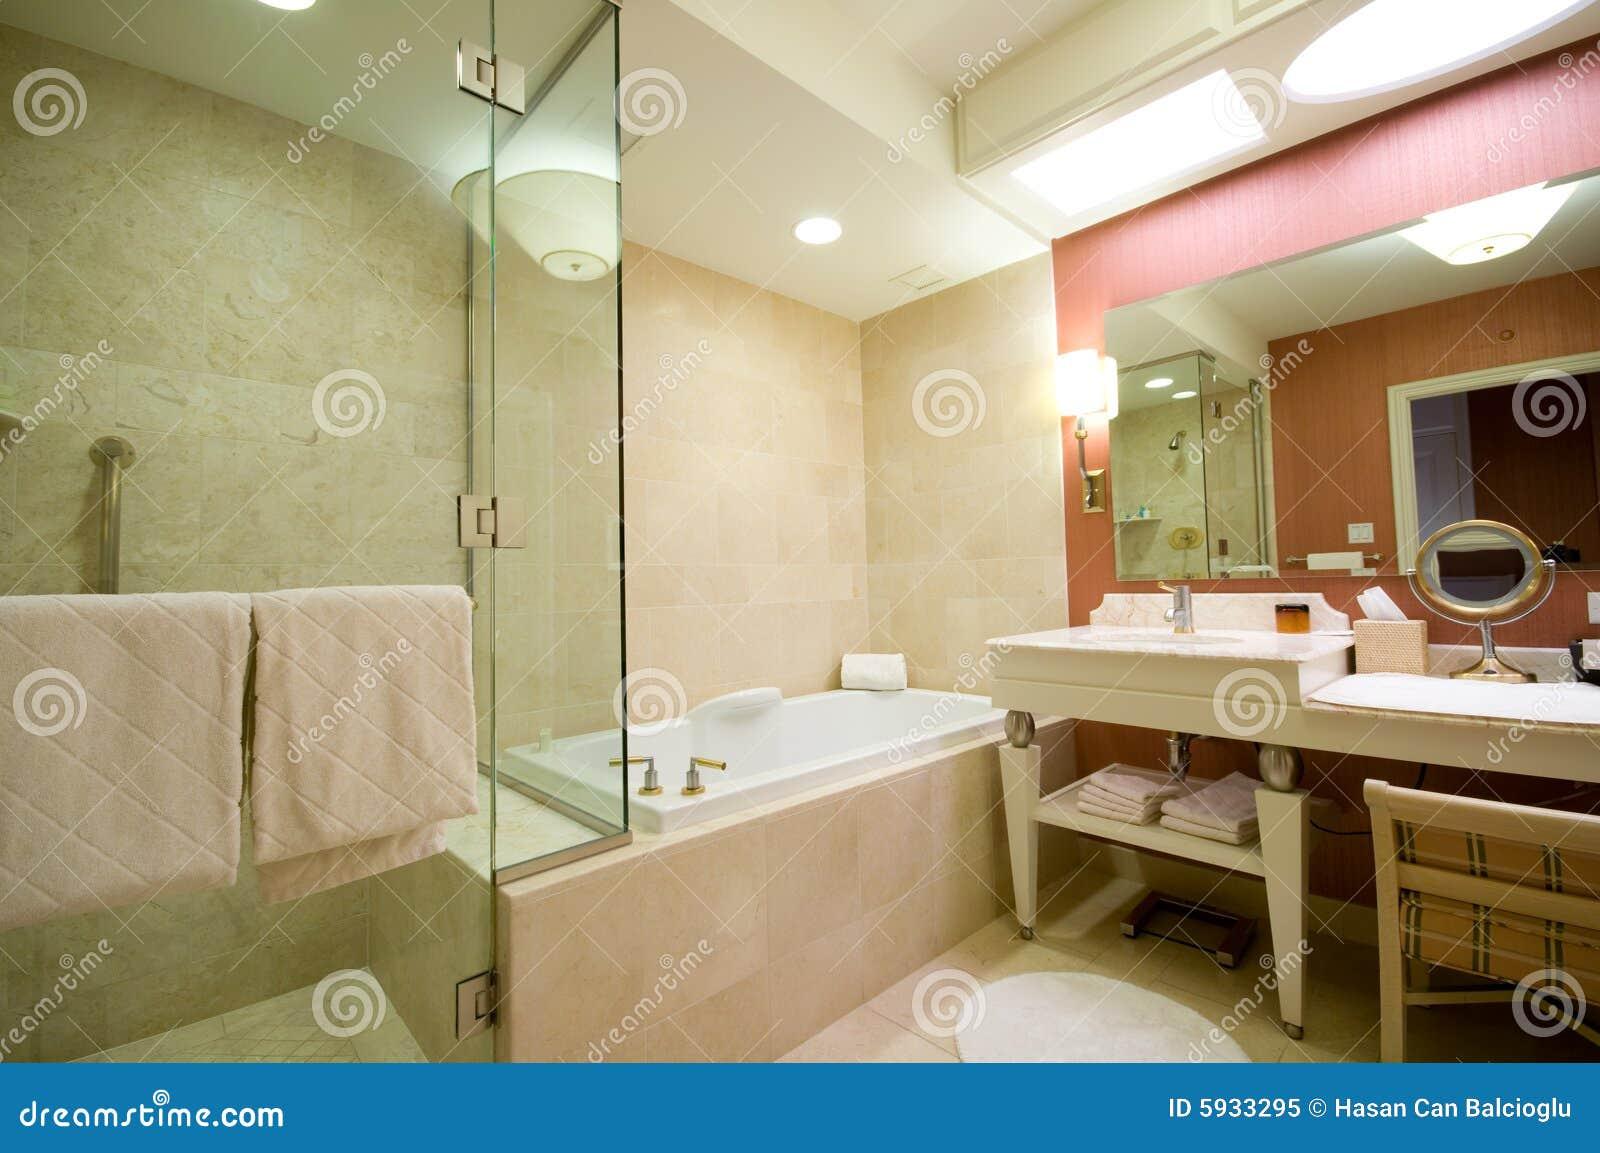 Banheiro Do Hotel De Luxo Foto de Stock Royalty Free  Imagem 5933295 -> Banheiro De Hotel Com Banheira